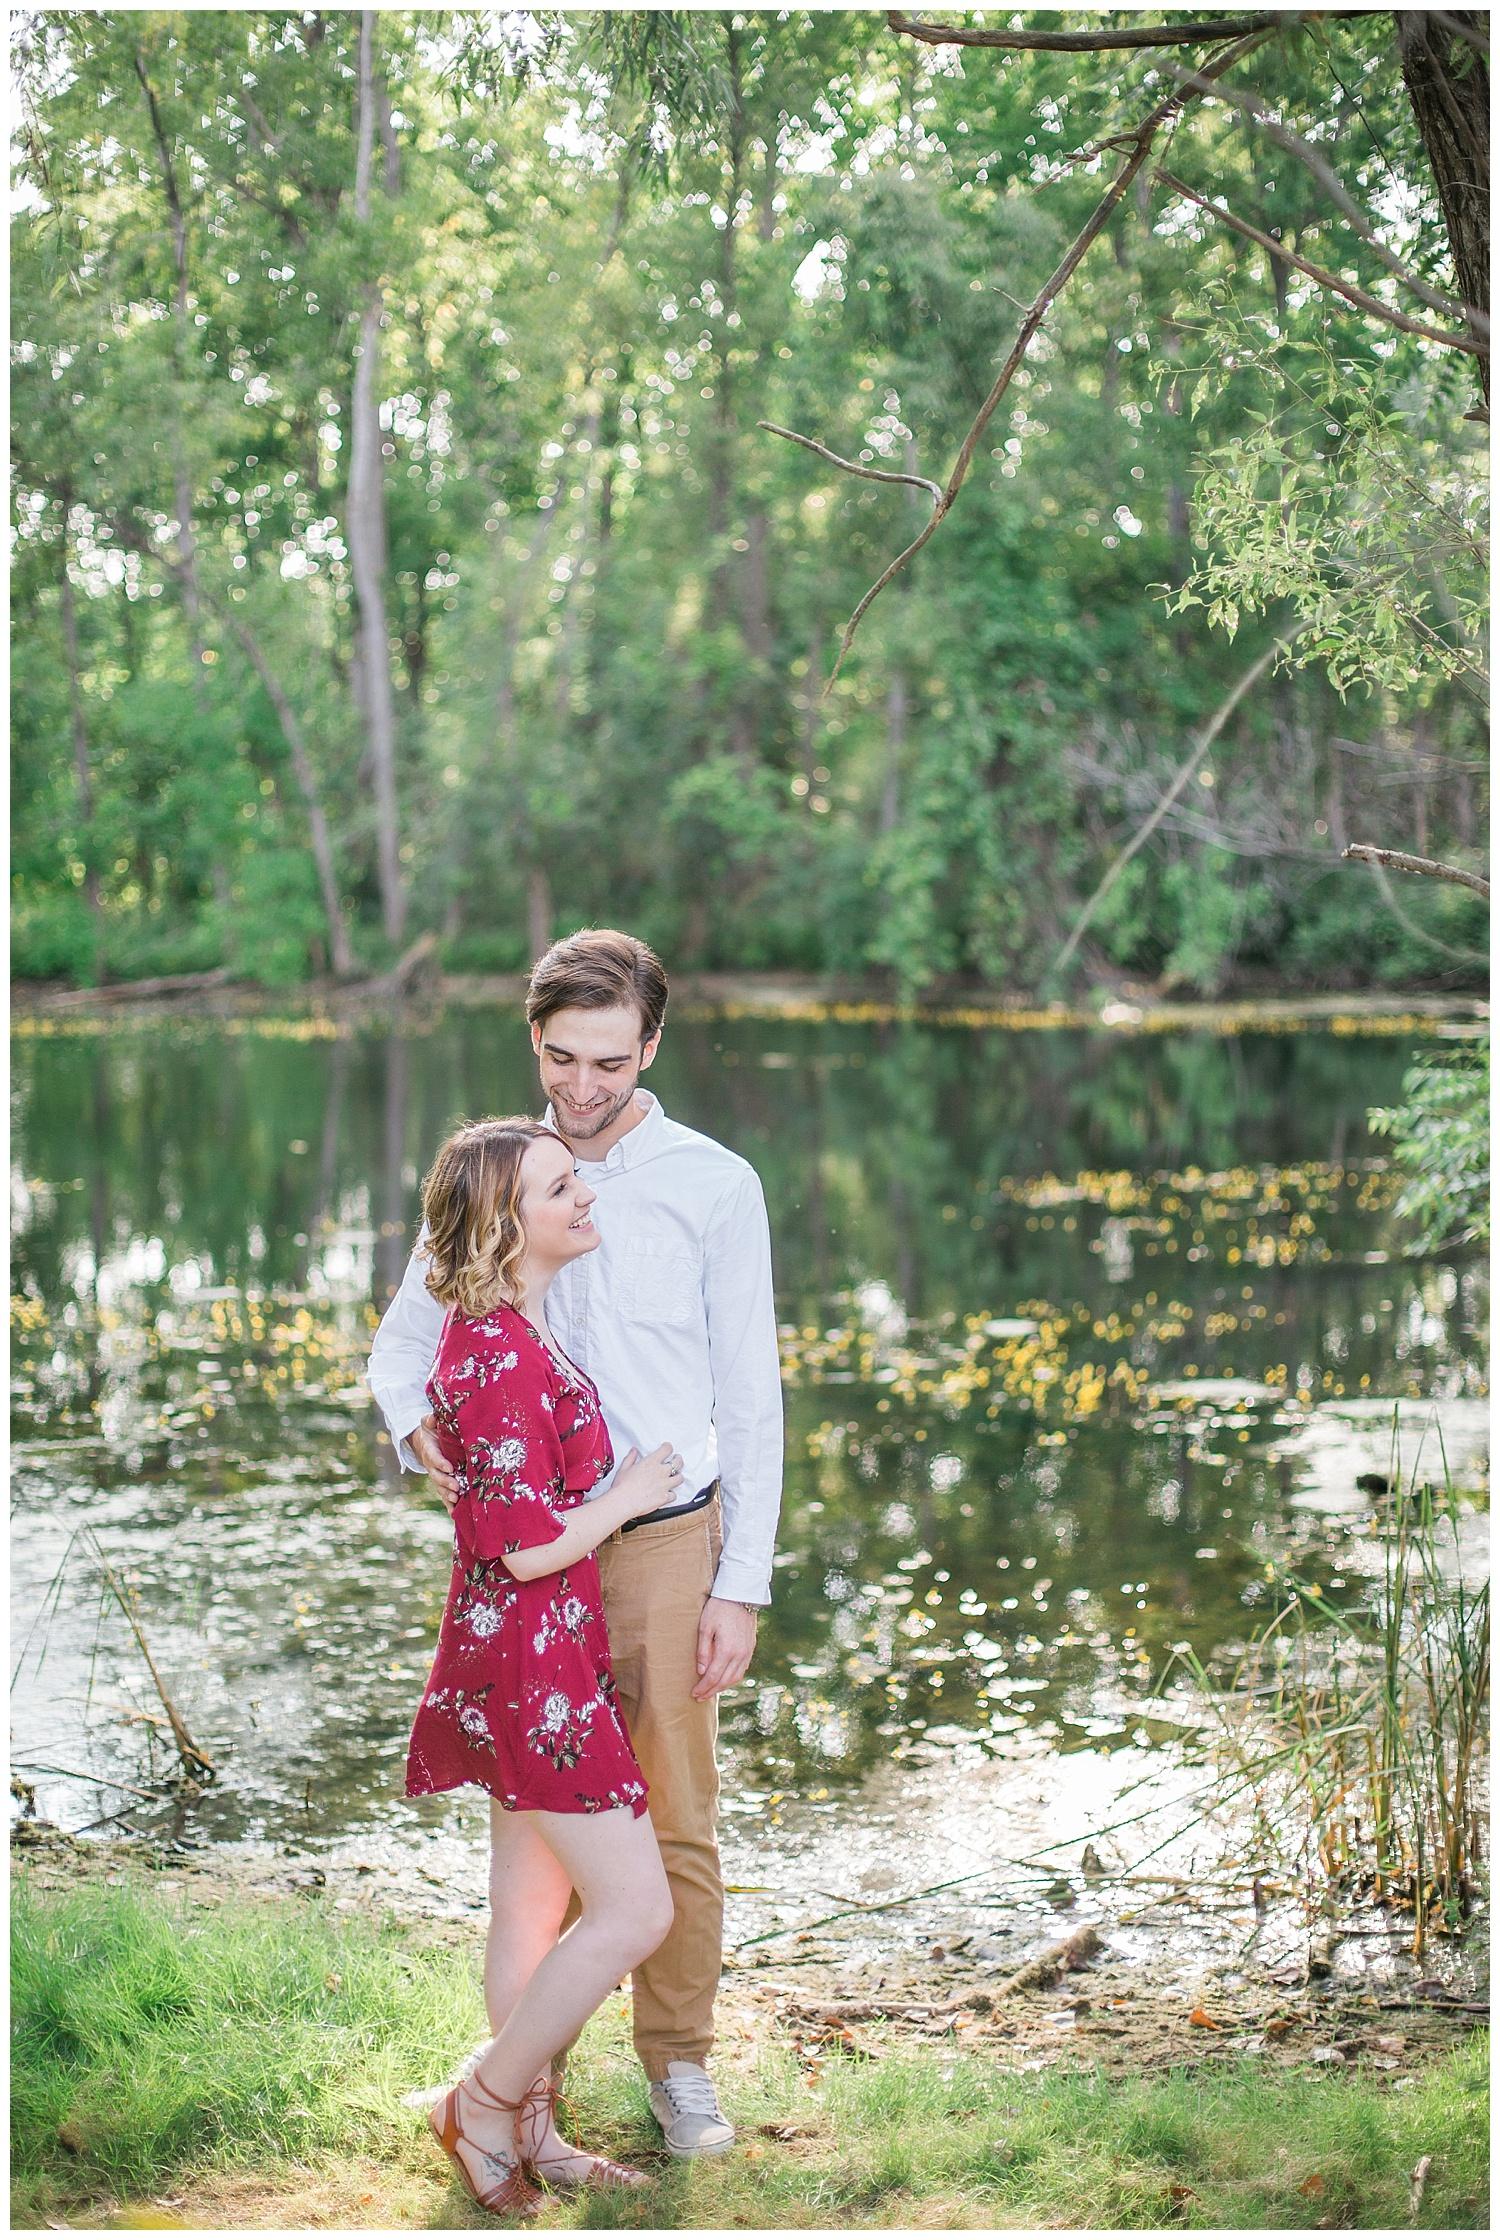 Tanya and Ryan - Sweetheart session - Lass & Beau - Geneseo NY-104_Buffalo wedding photography.jpg